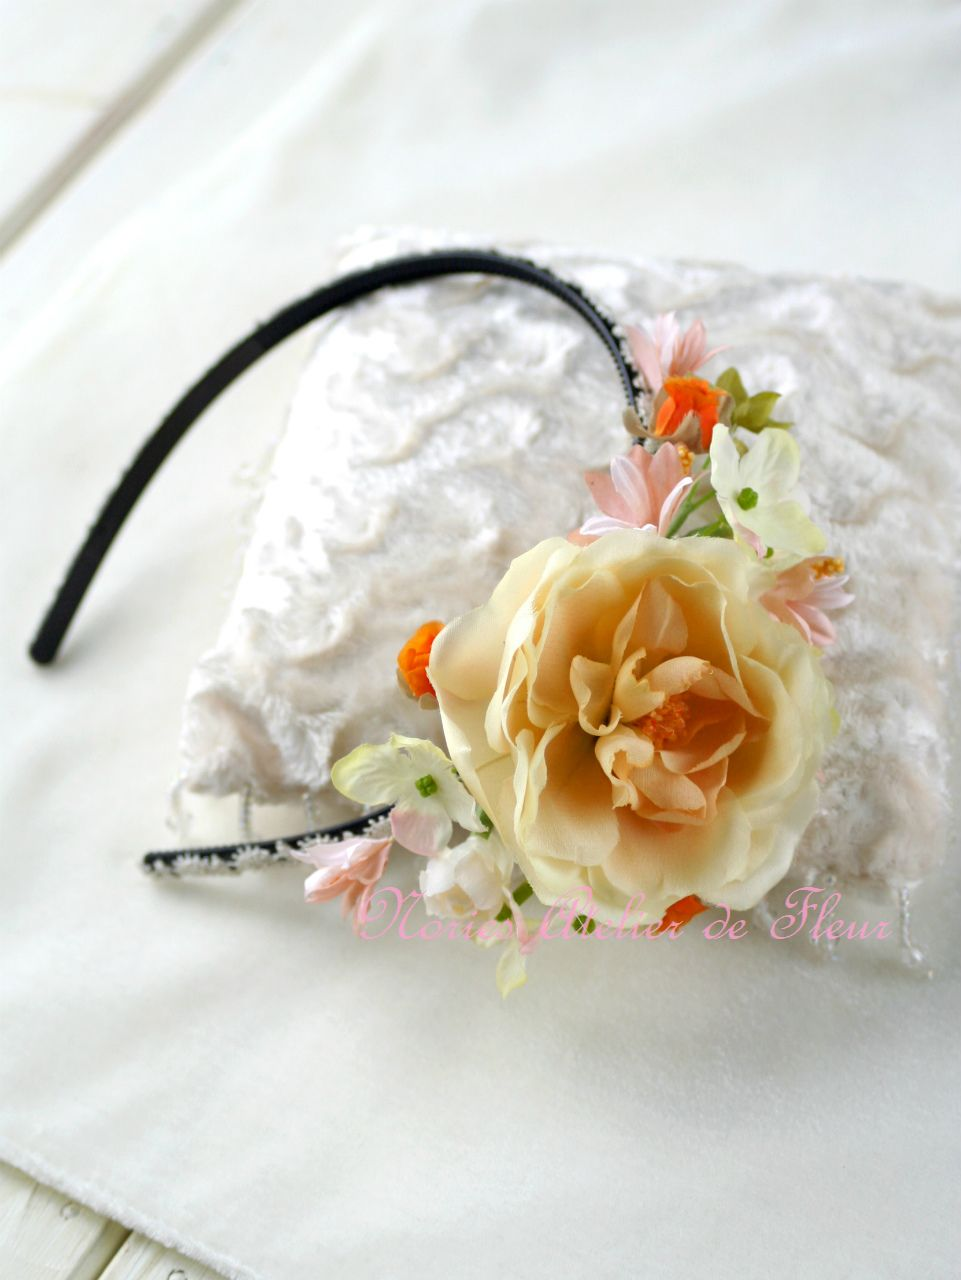 Enola エノーラ おそろいの花材でカチューシャ